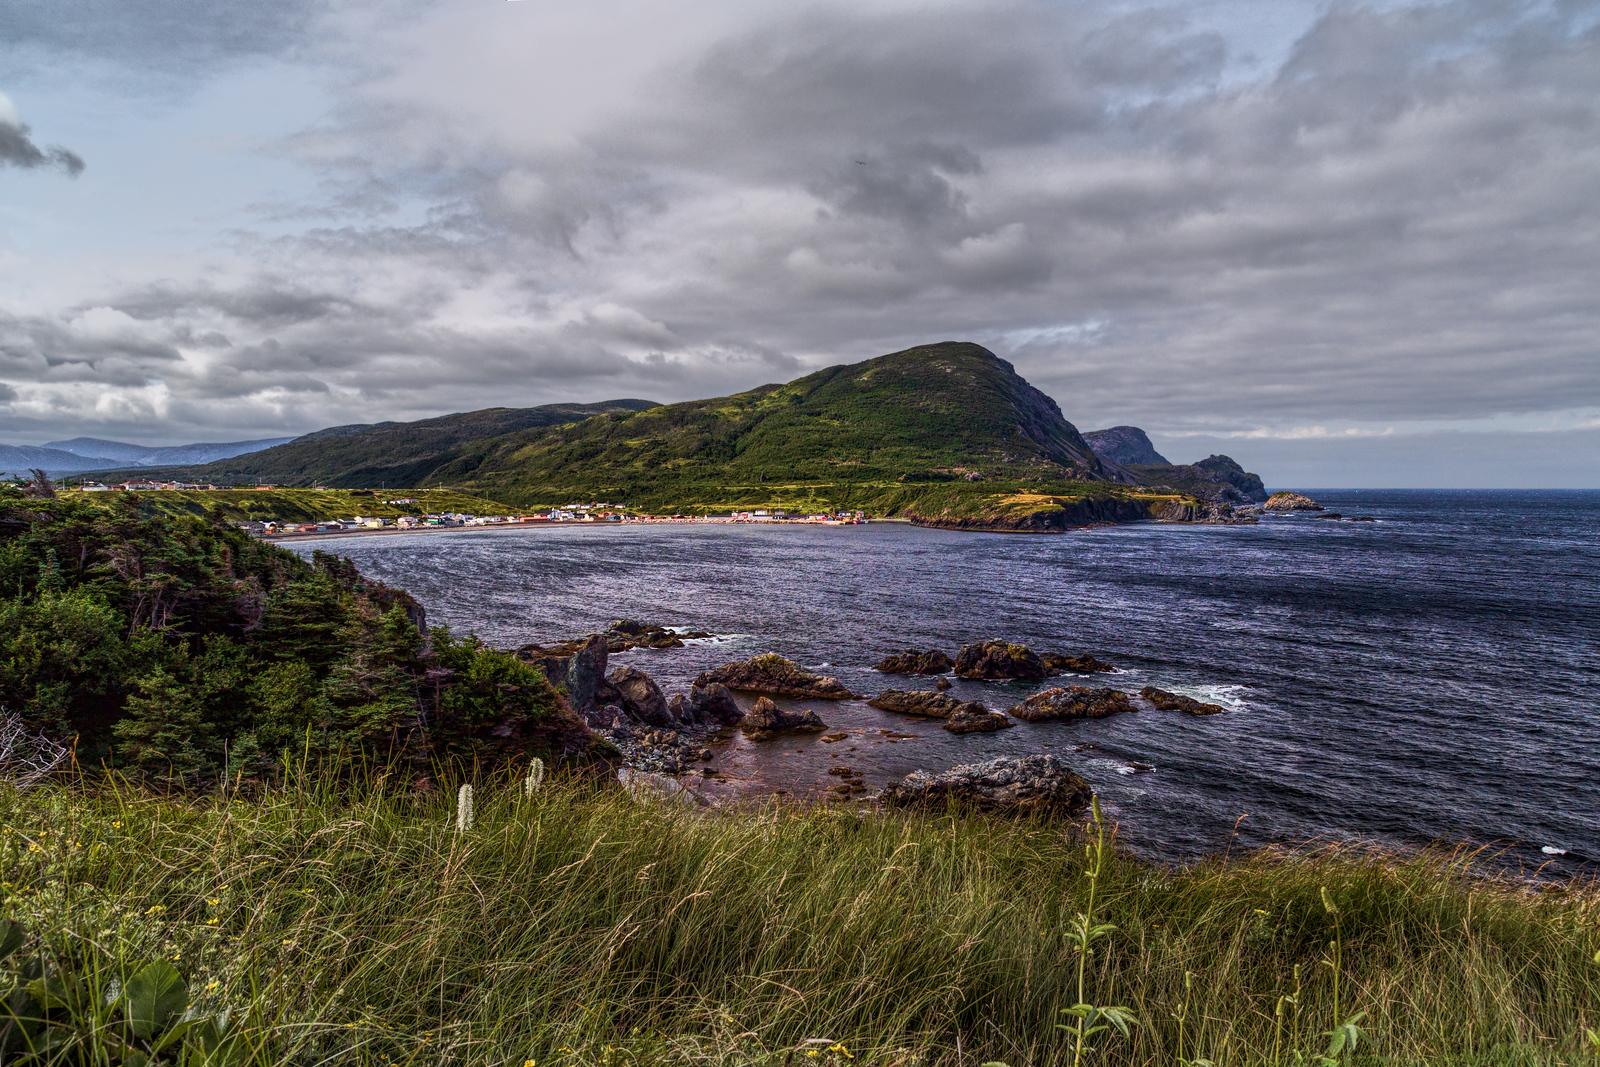 Trout River, Newfoundland